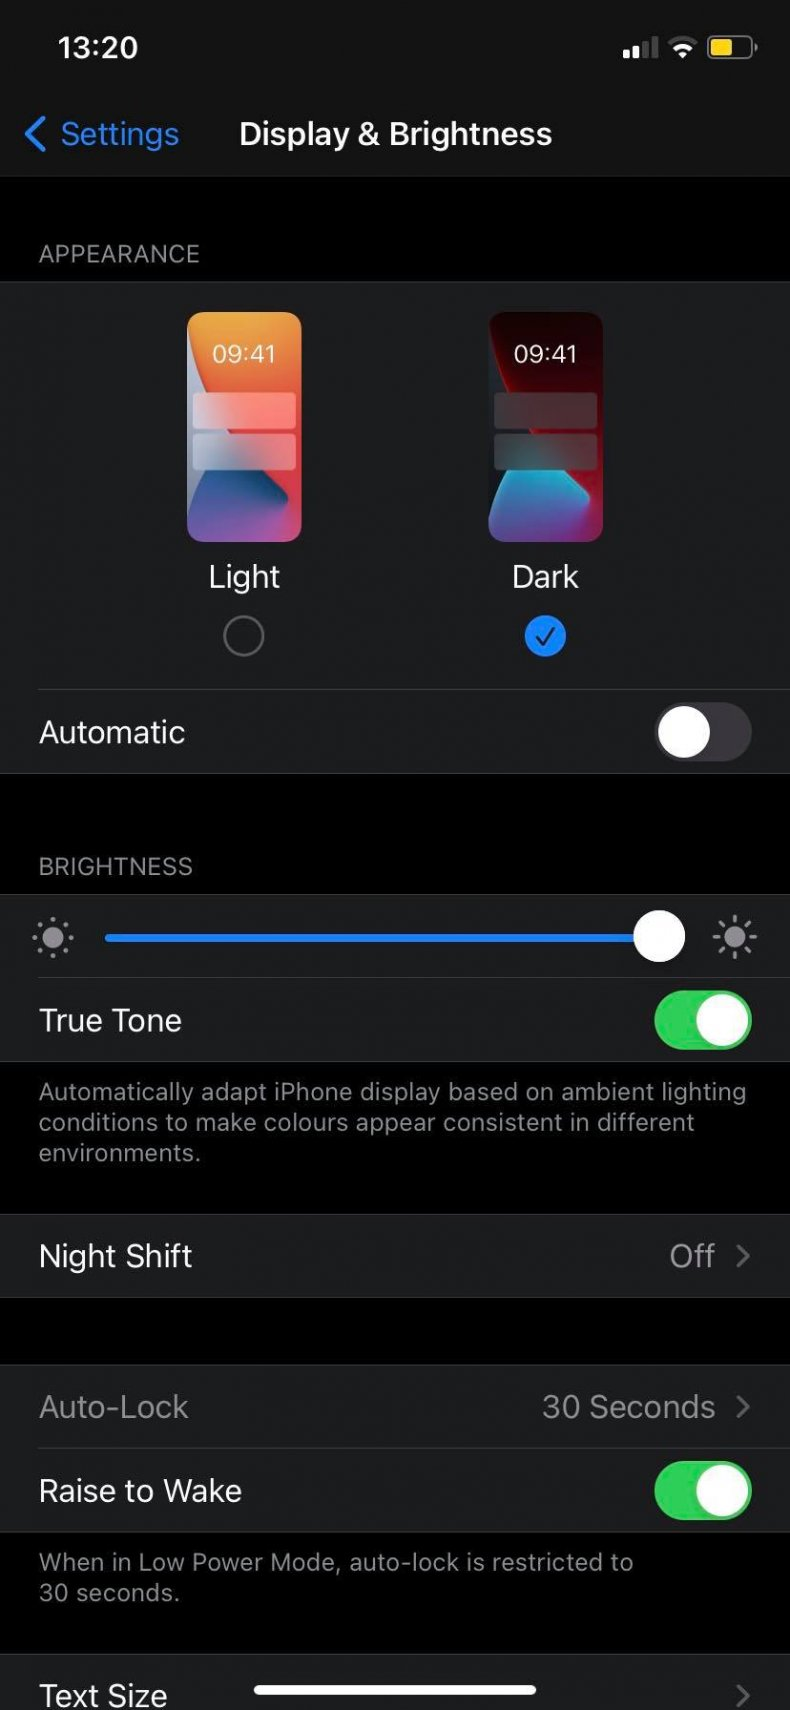 Dark Theme on an iPhone